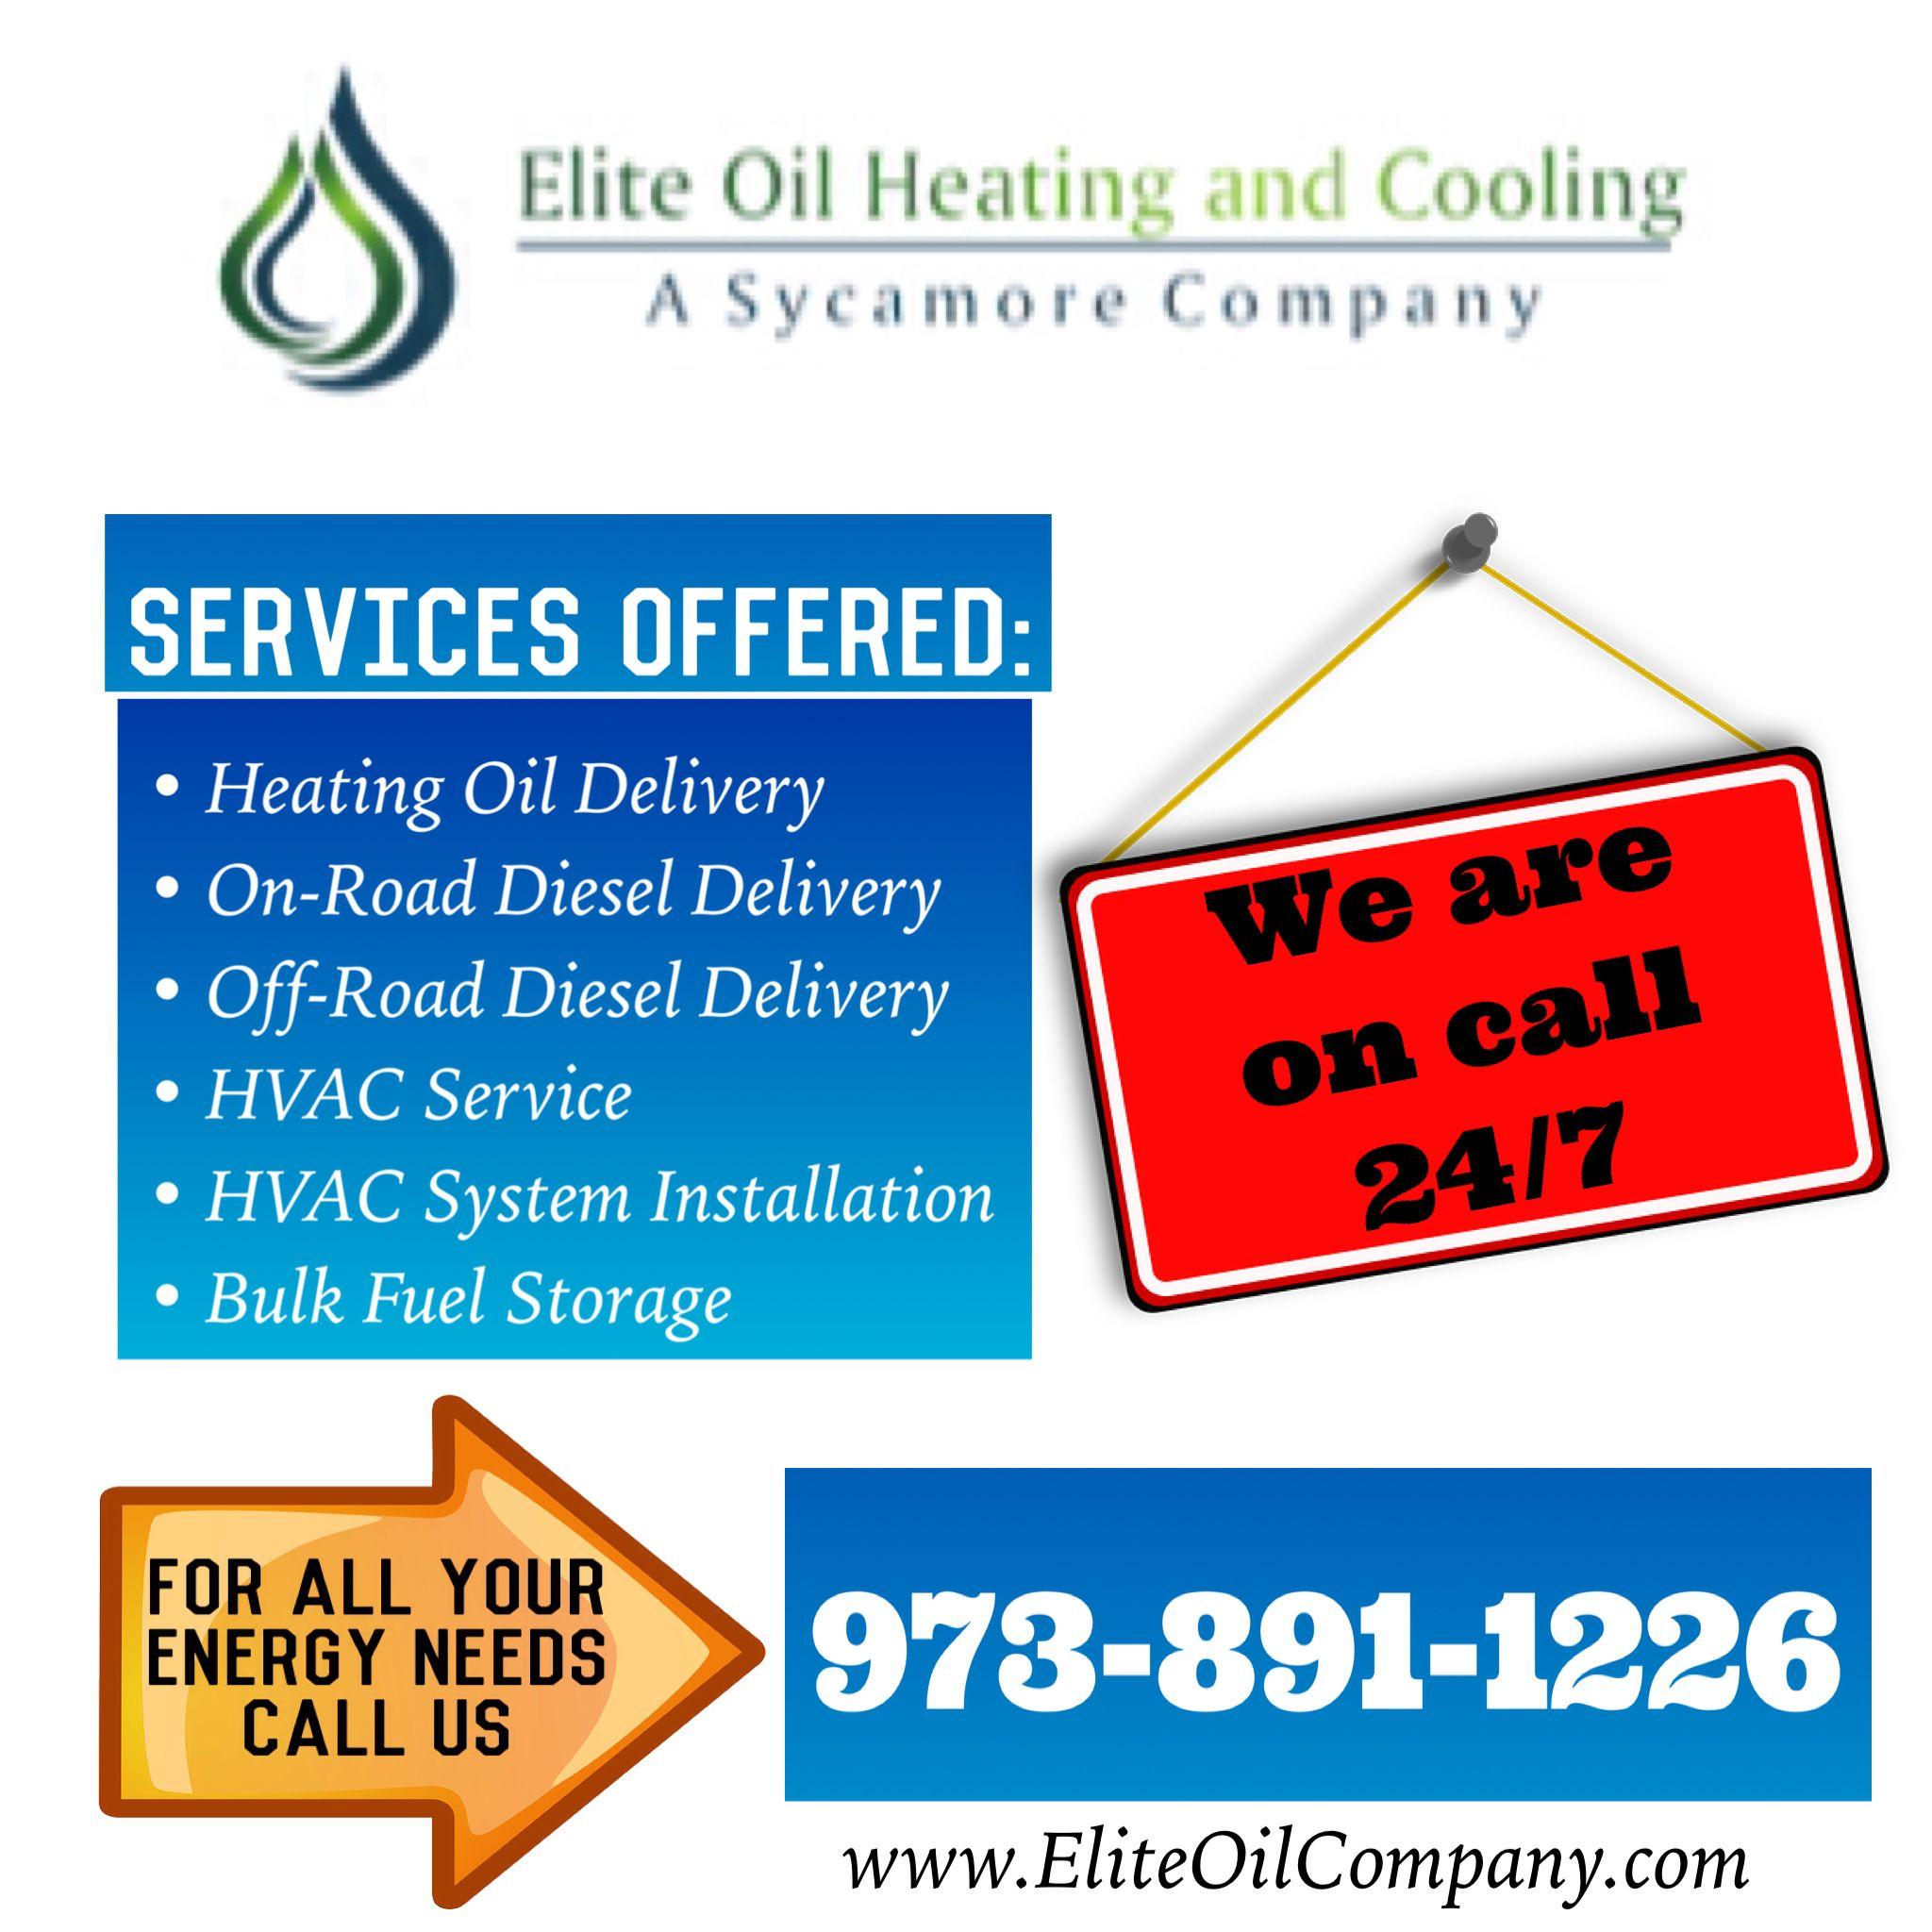 Elite Oil Company Ad Image Heating Oil Hvac Services Hvac System